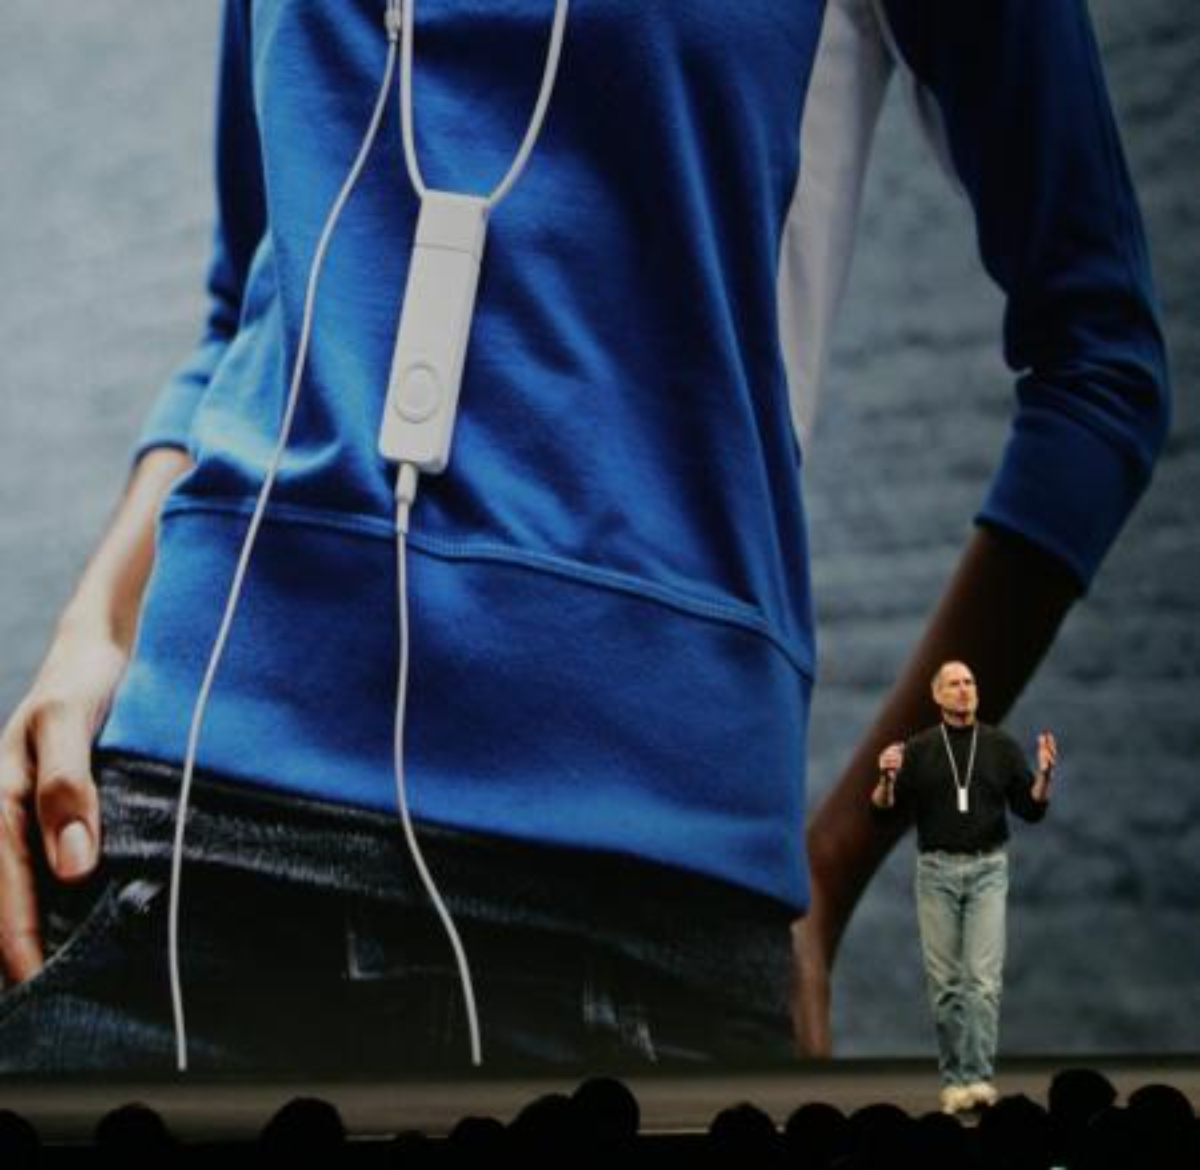 Steve Jobs iPod shuffle keynote